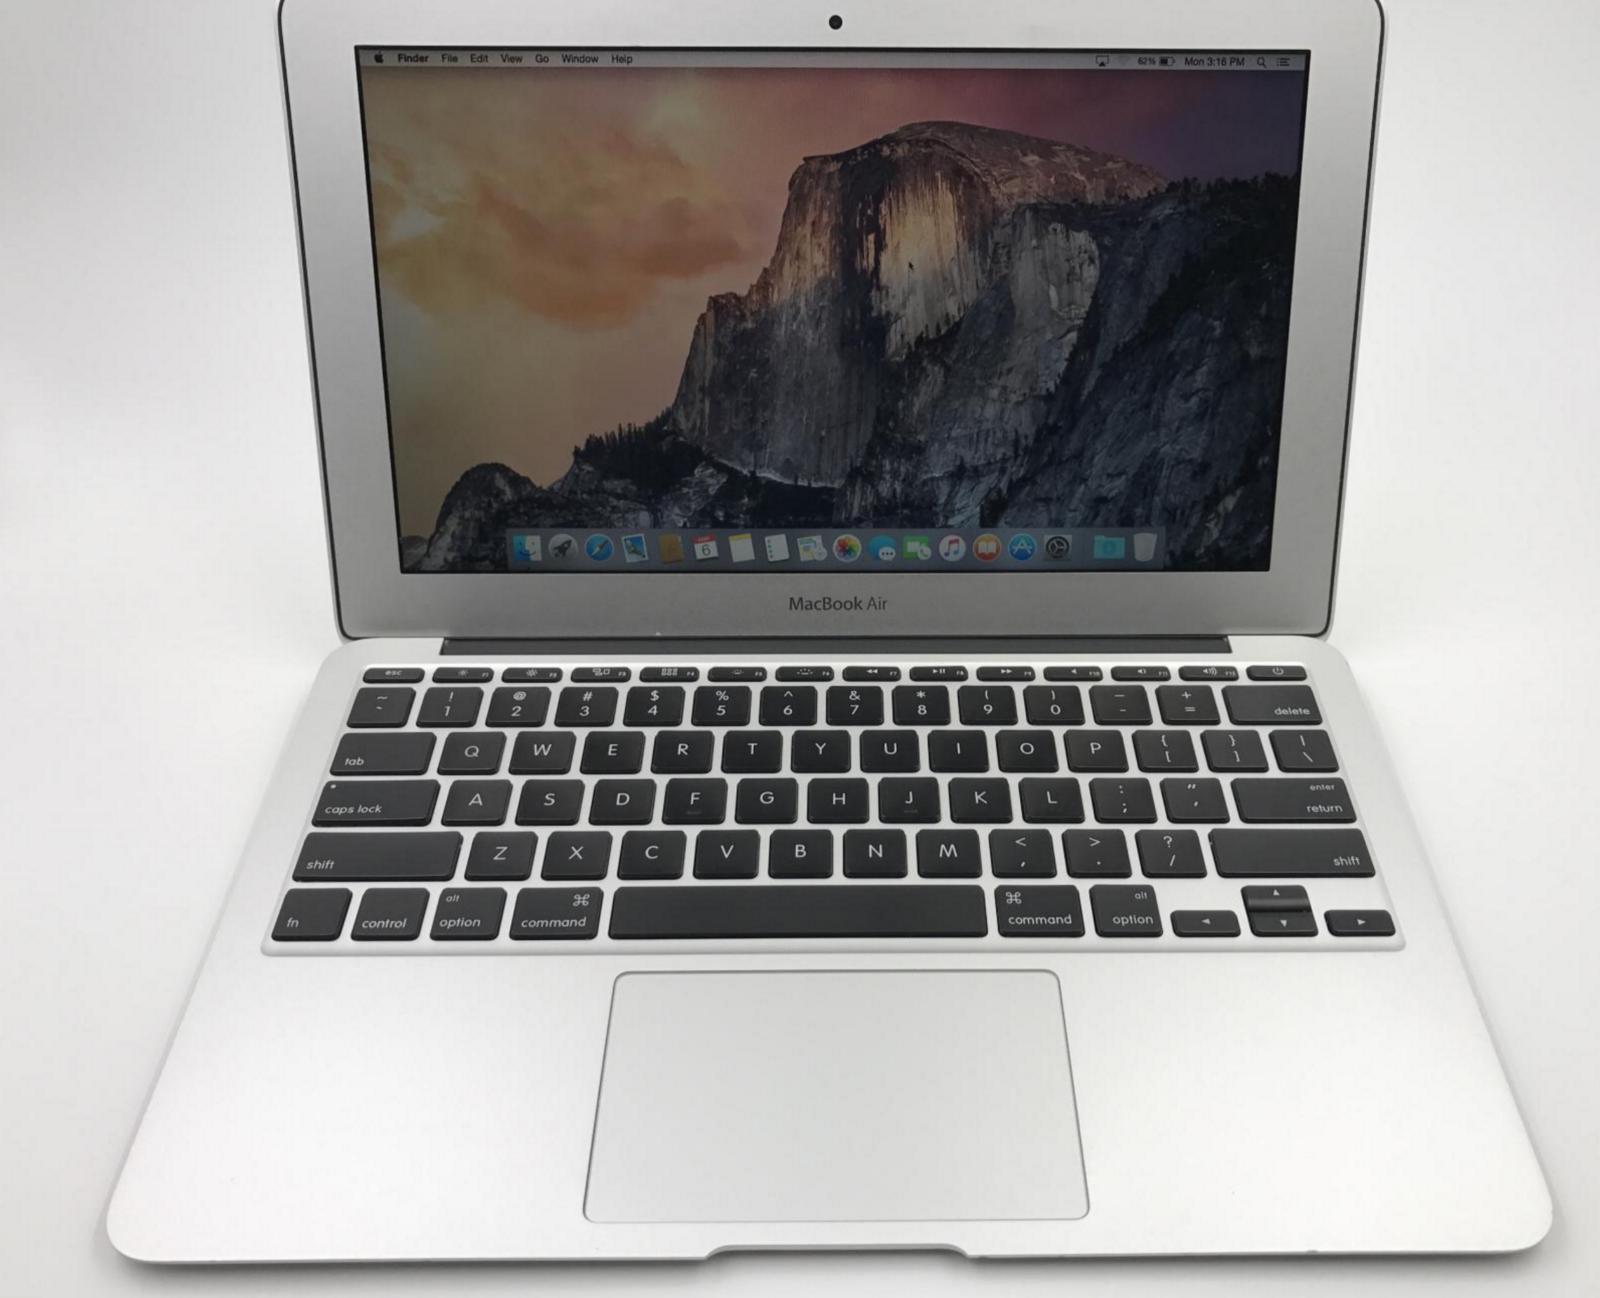 Apple Macbook Air 11.6in 1.3 GHz Core i5 128 GB SSD 4GB RAM MD711LL/A